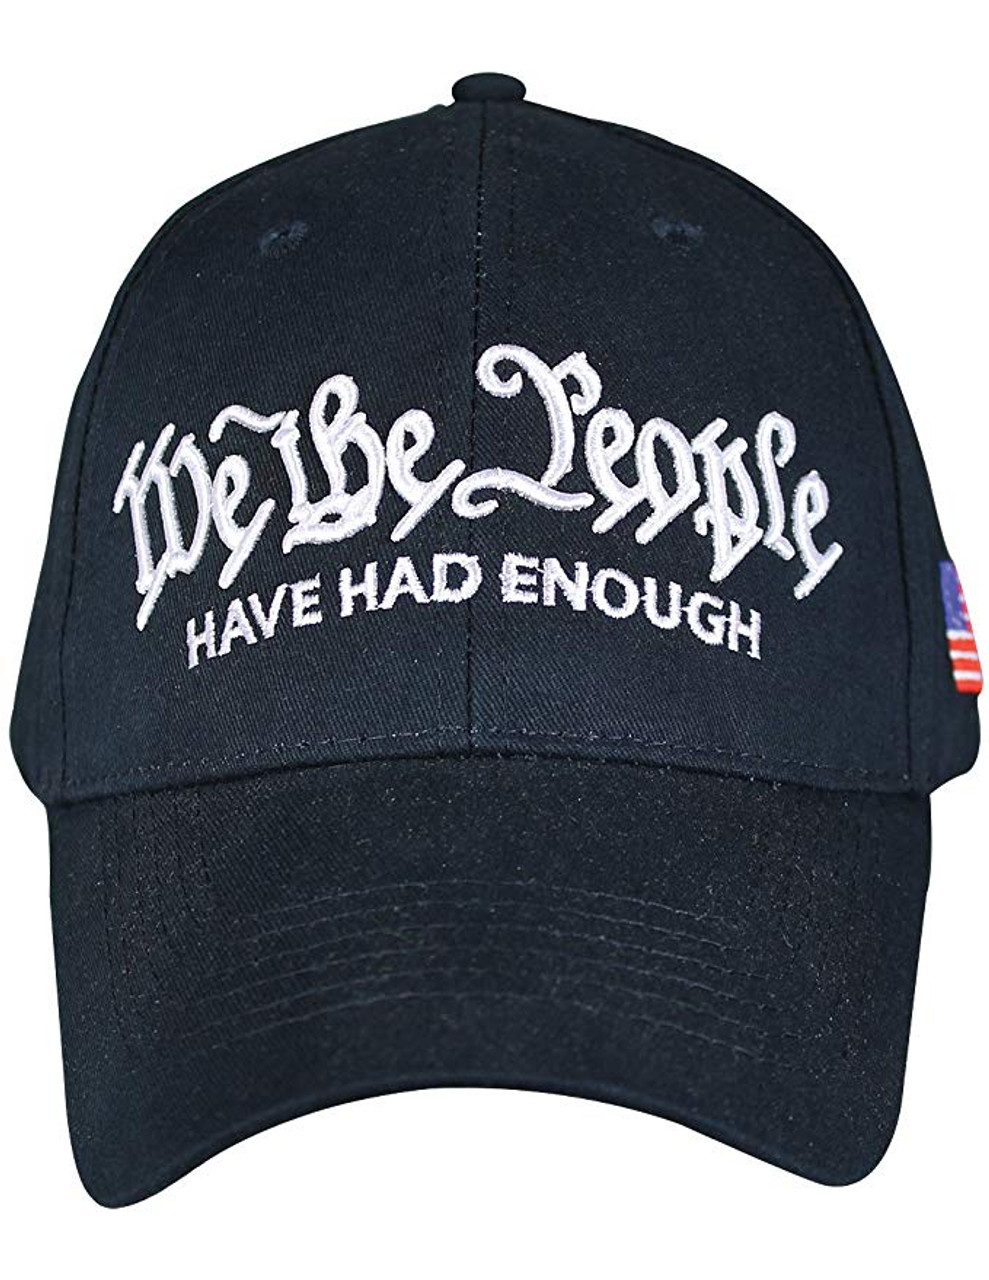 143df19d24765 6705 - We The People Cap - Have Had Enough - Cotton -Dark Blue -  USMILITARYHATS.COM